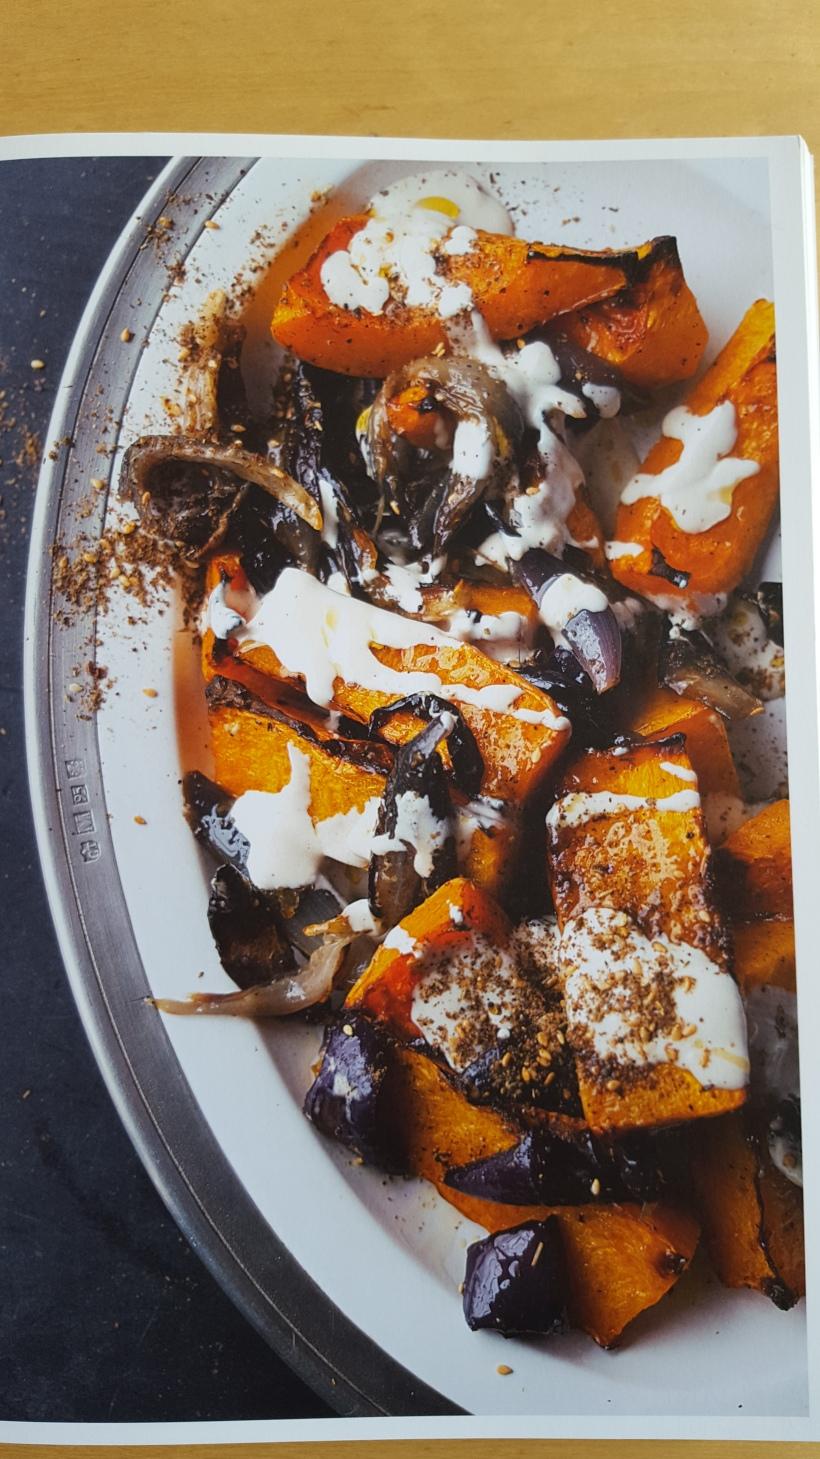 #Kürbis; #Herbst #Soulfood; #Herbstküche; #Jerusalem